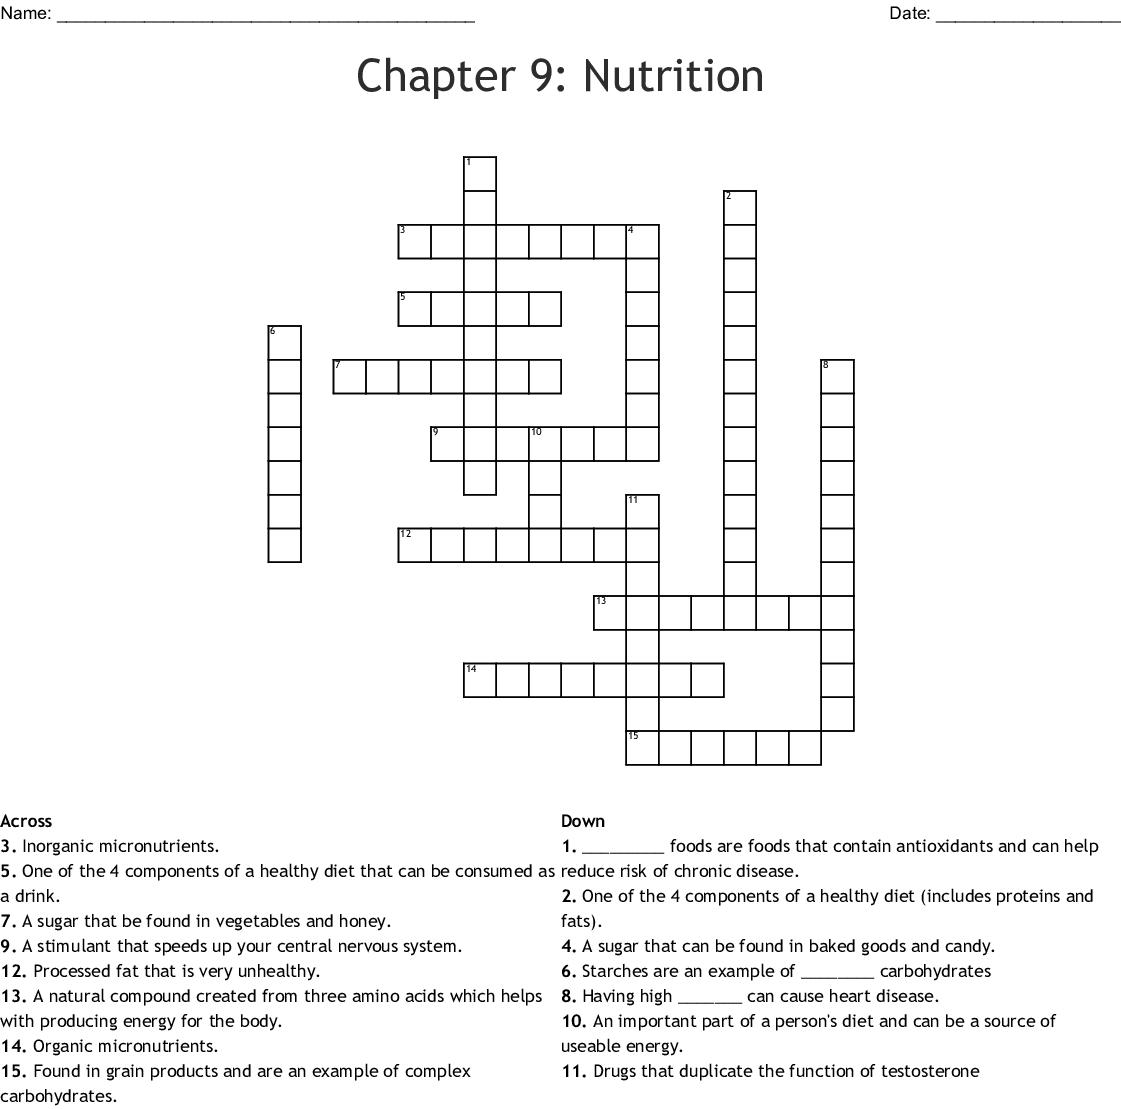 Chapter 9 Nutrition Crossword